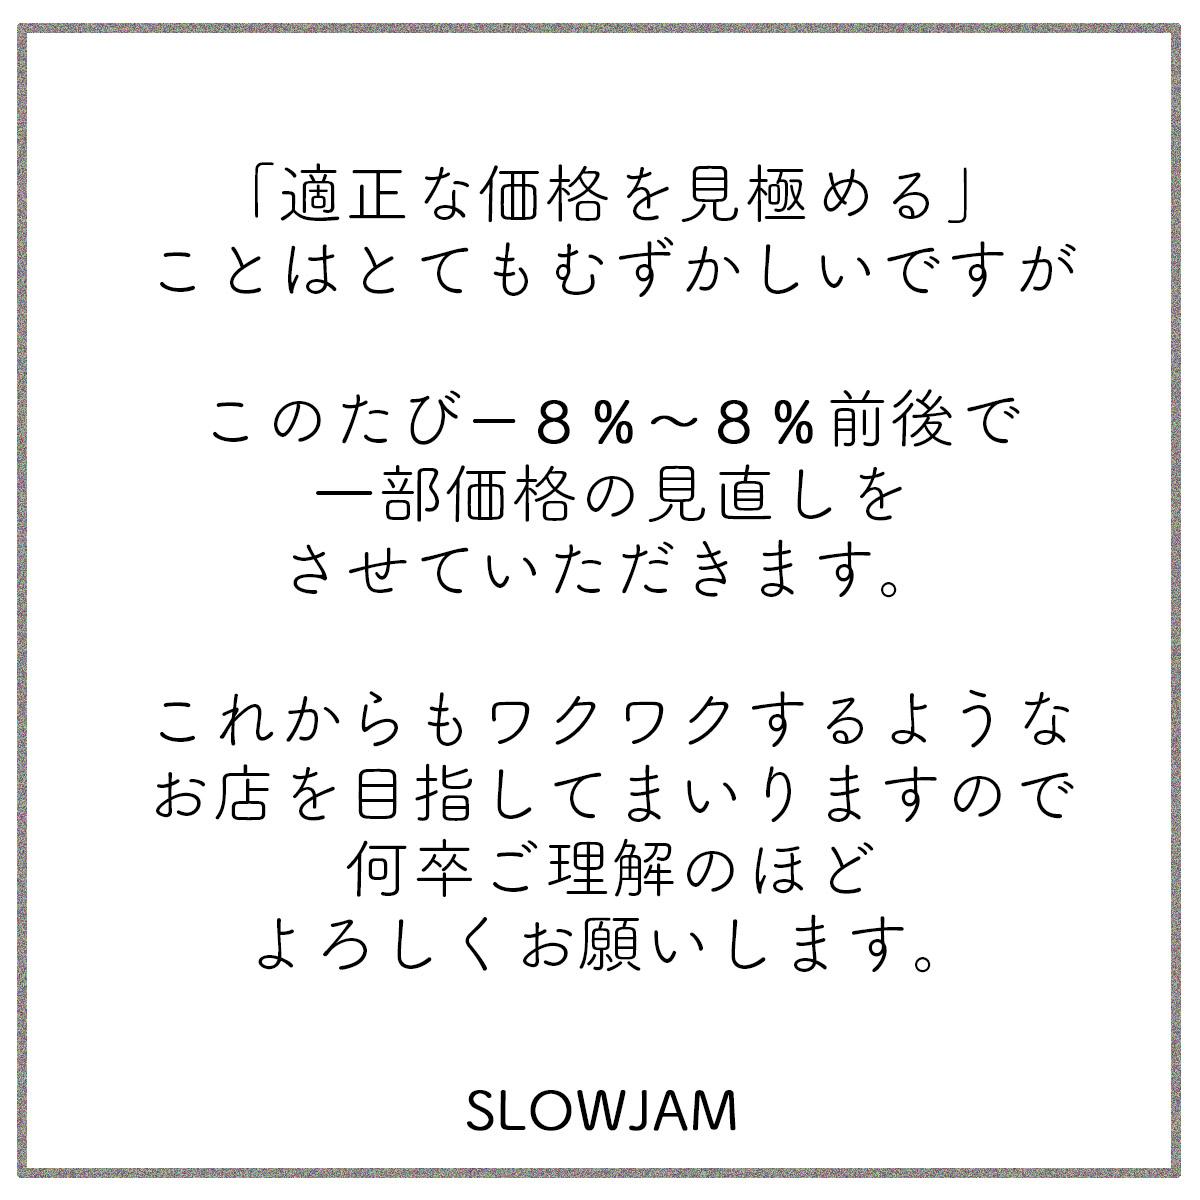 f:id:slowjam-nara:20190421002806j:plain